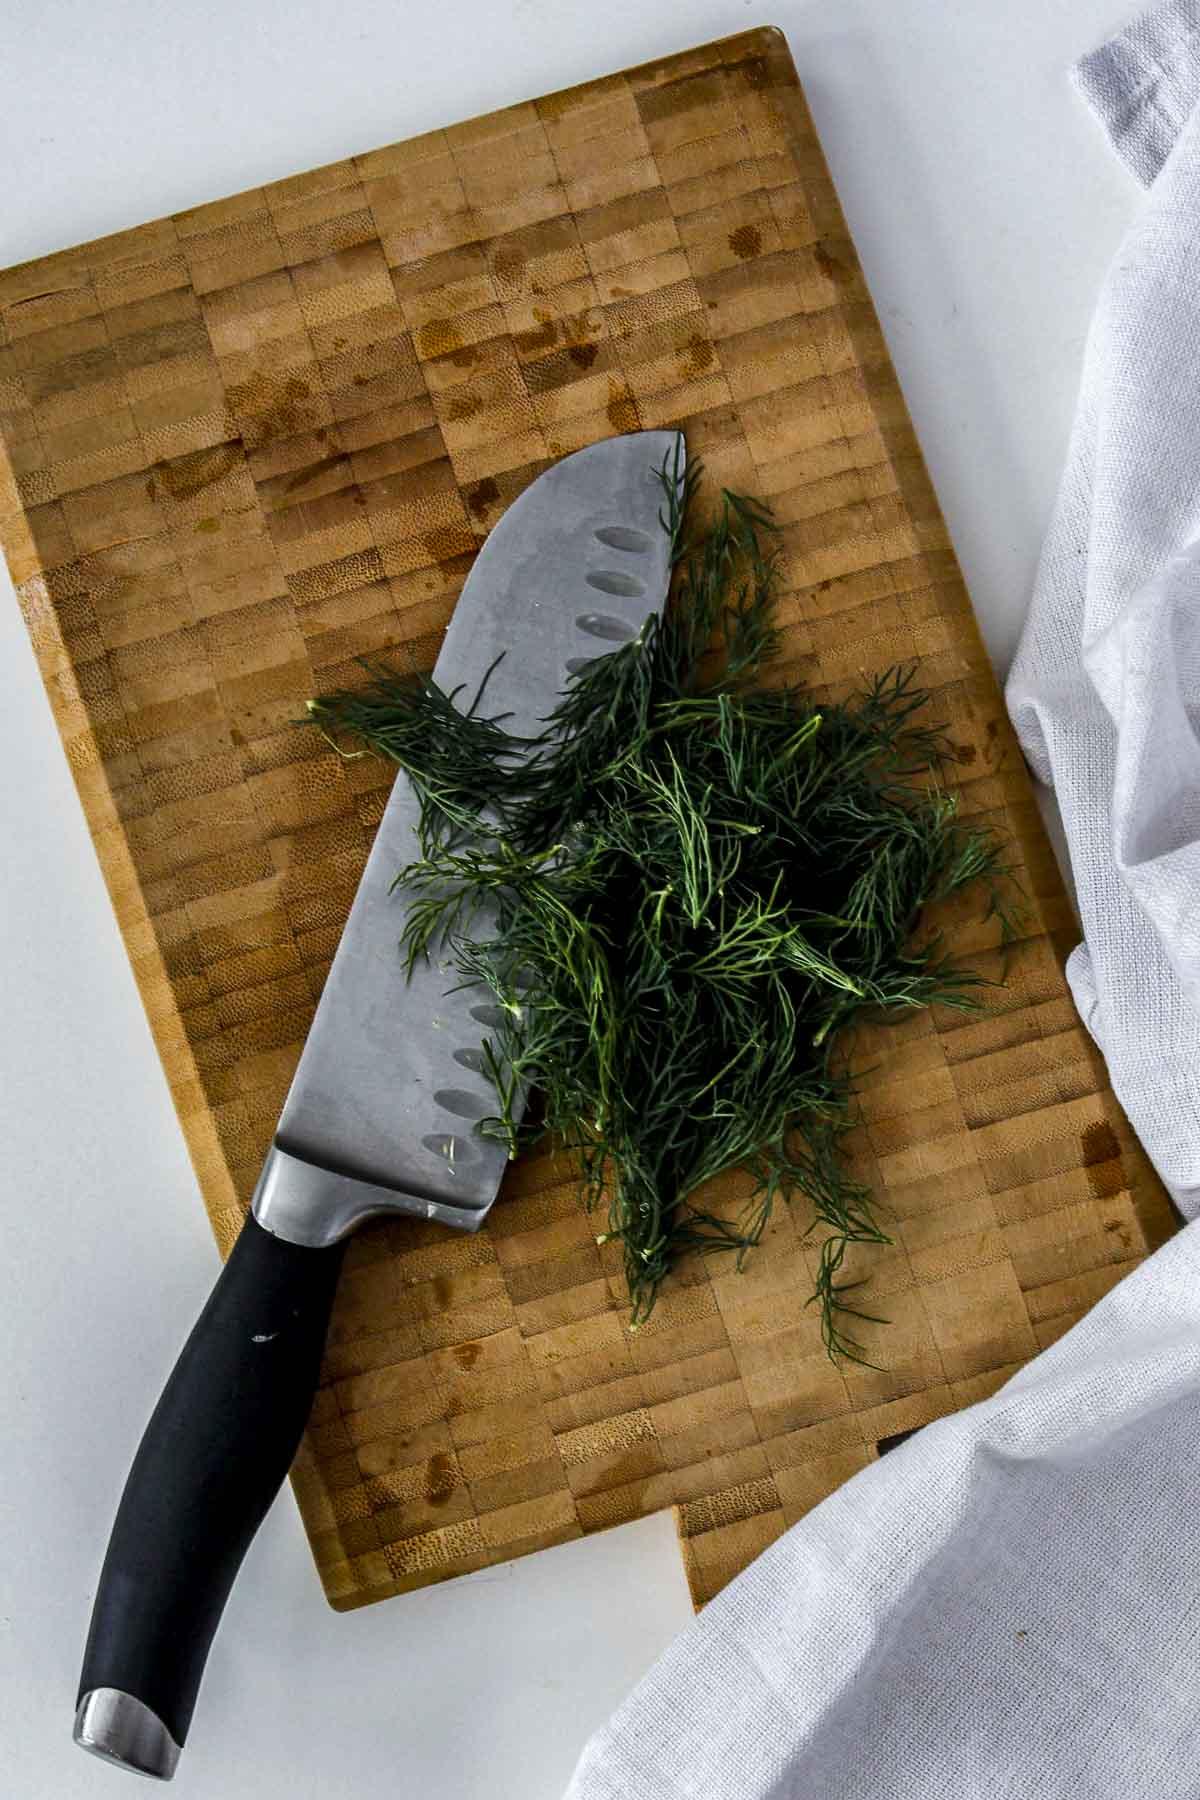 Fresh dill being chopped on a cutting board.